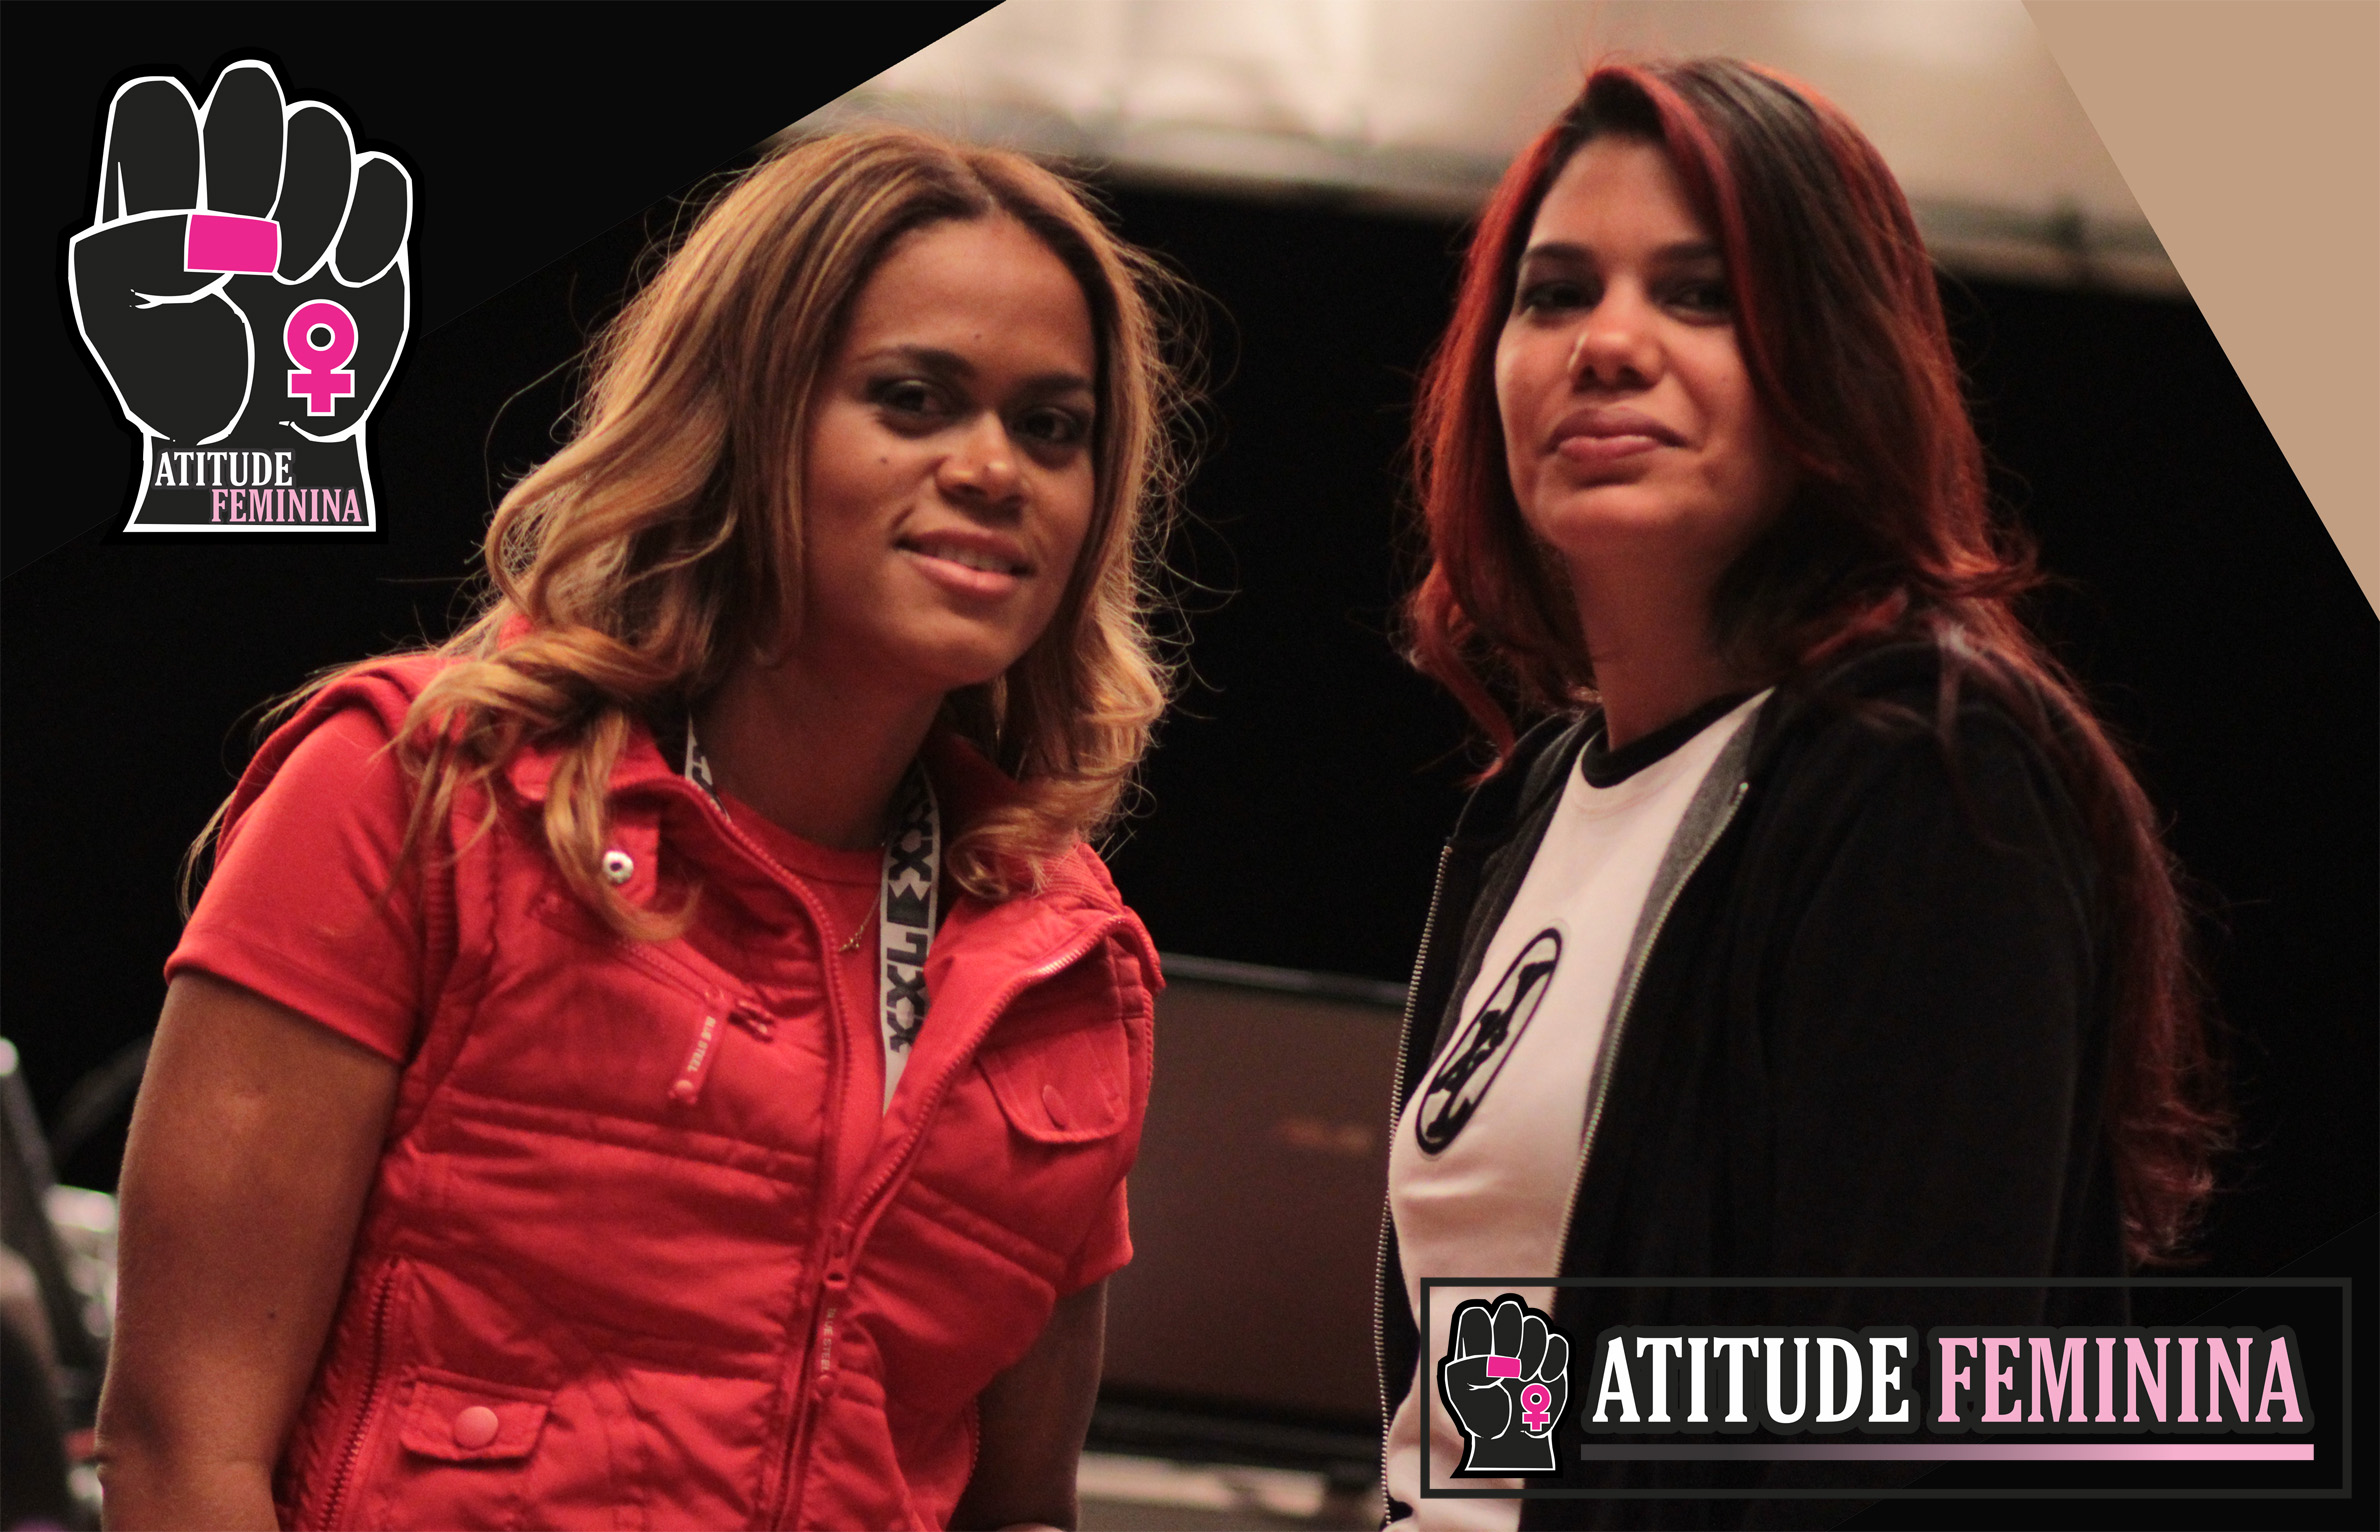 8d6ed5d8a8938 Atitude Feminina « Atitude Feminina